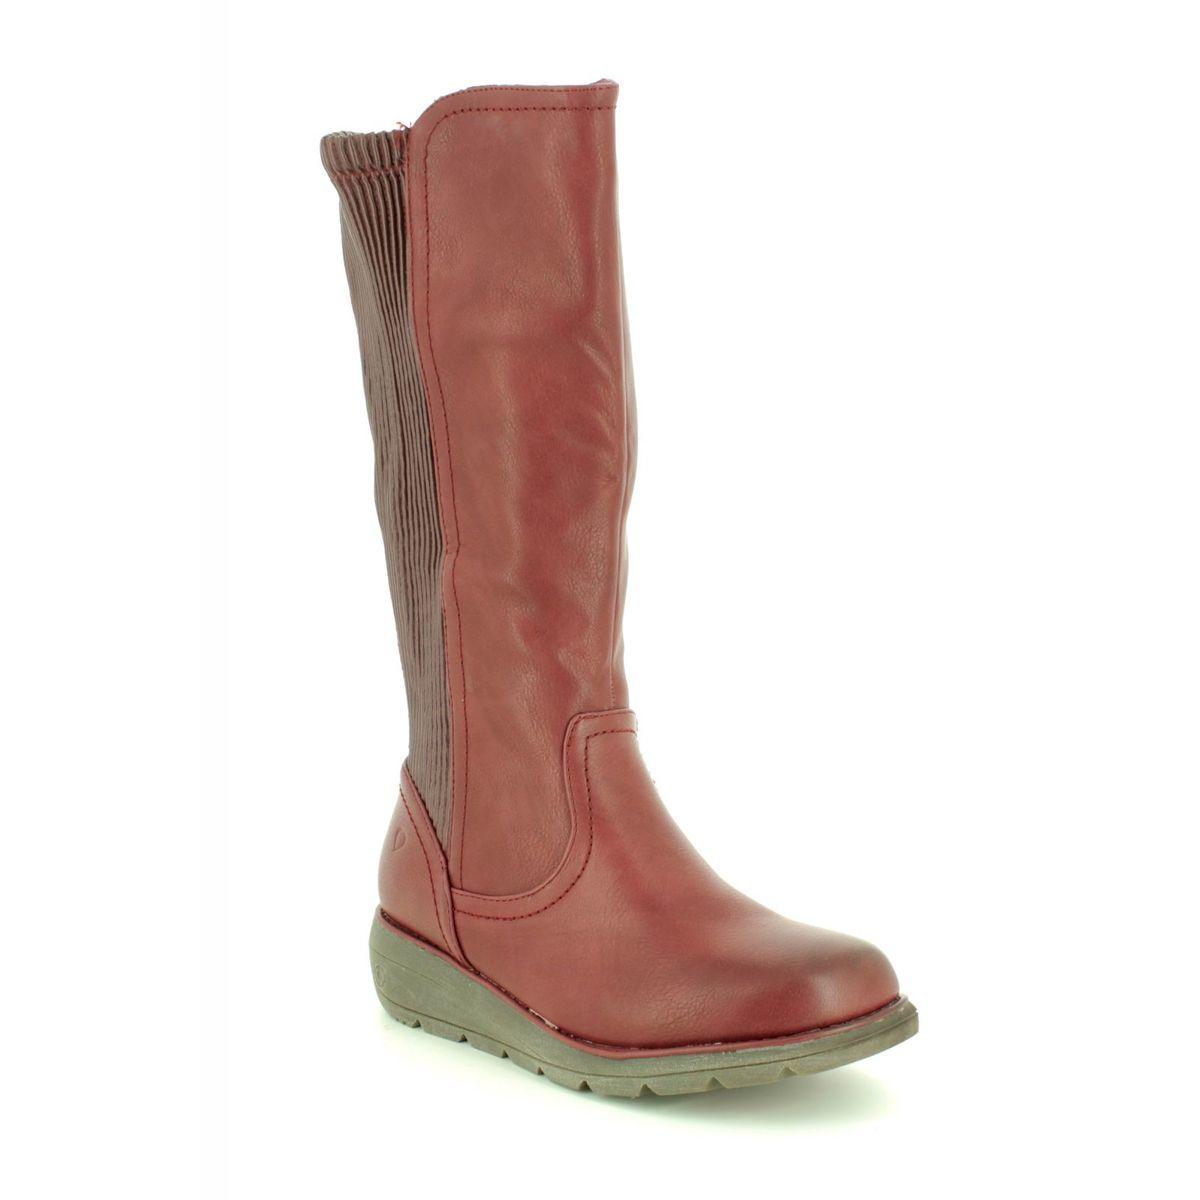 c1c8c49b Heavenly Feet Knee-high Boots - Red - 8524/80 URSULA 2